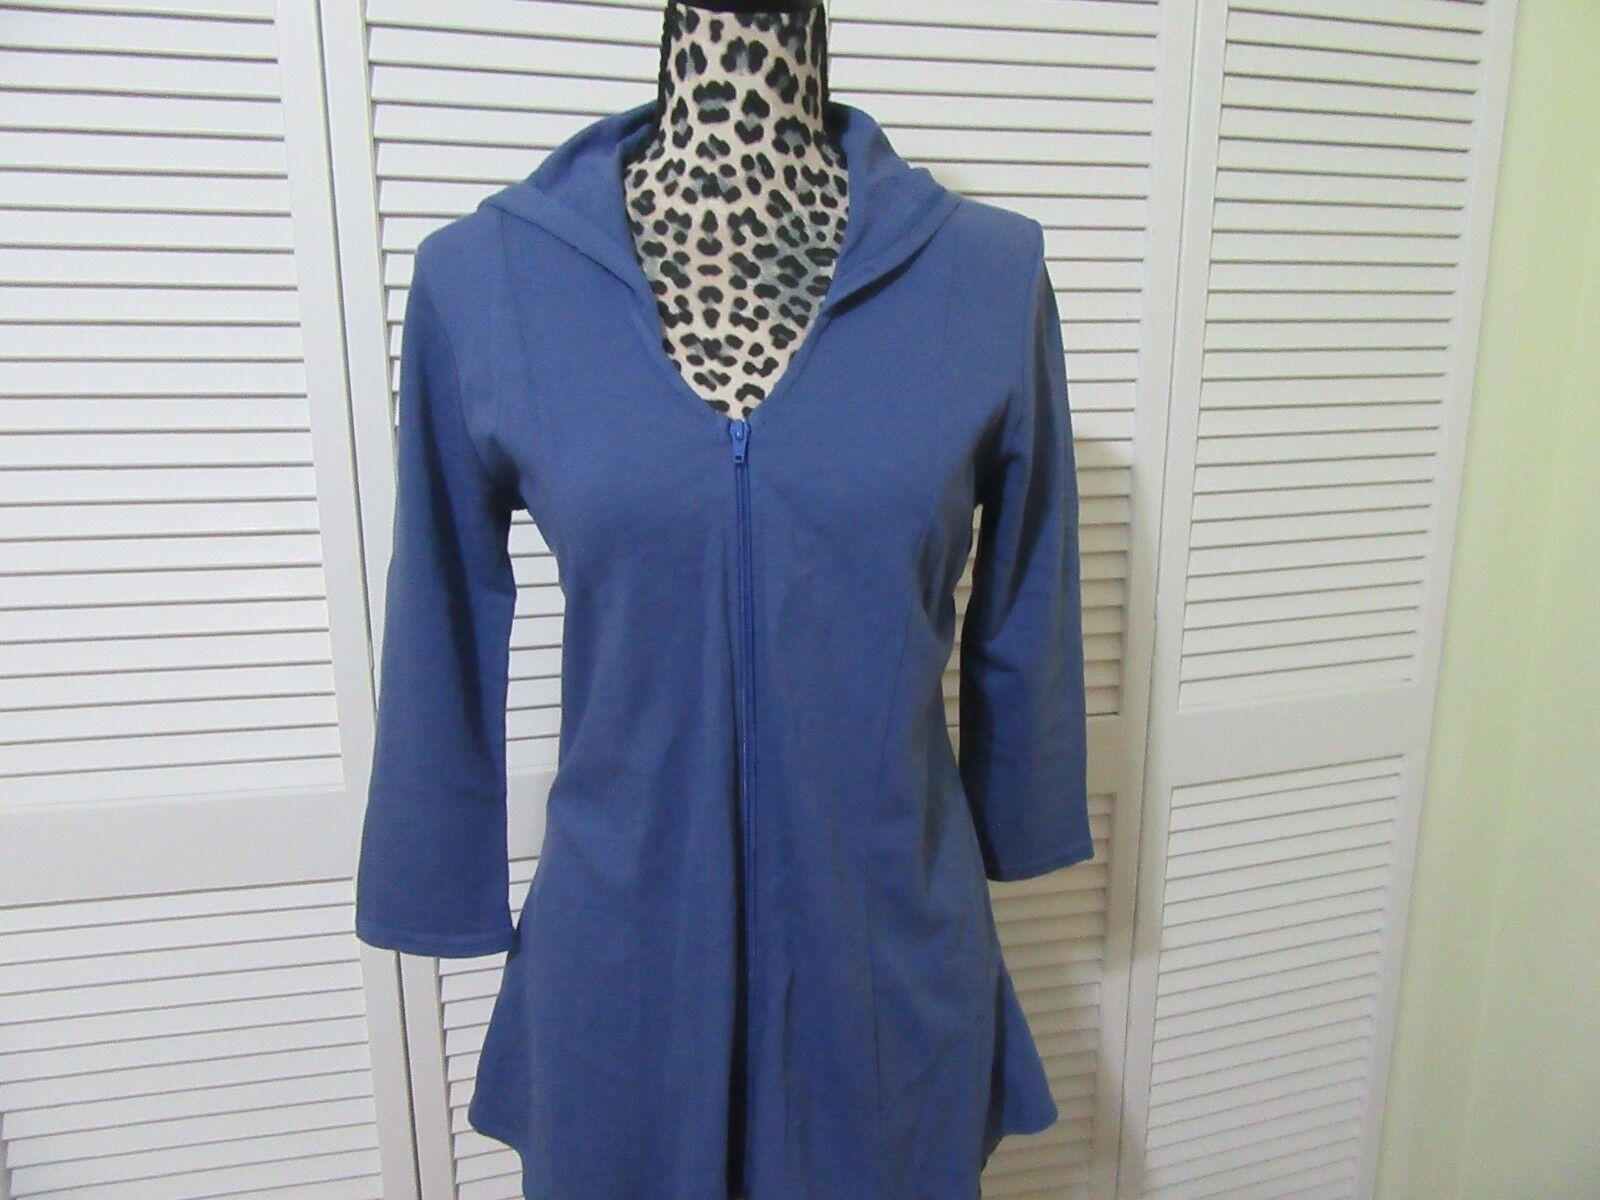 Hot Cotton Hoodie Jacket,oben daMänner Petite S,Full zipper,hoodie, slightly fitted